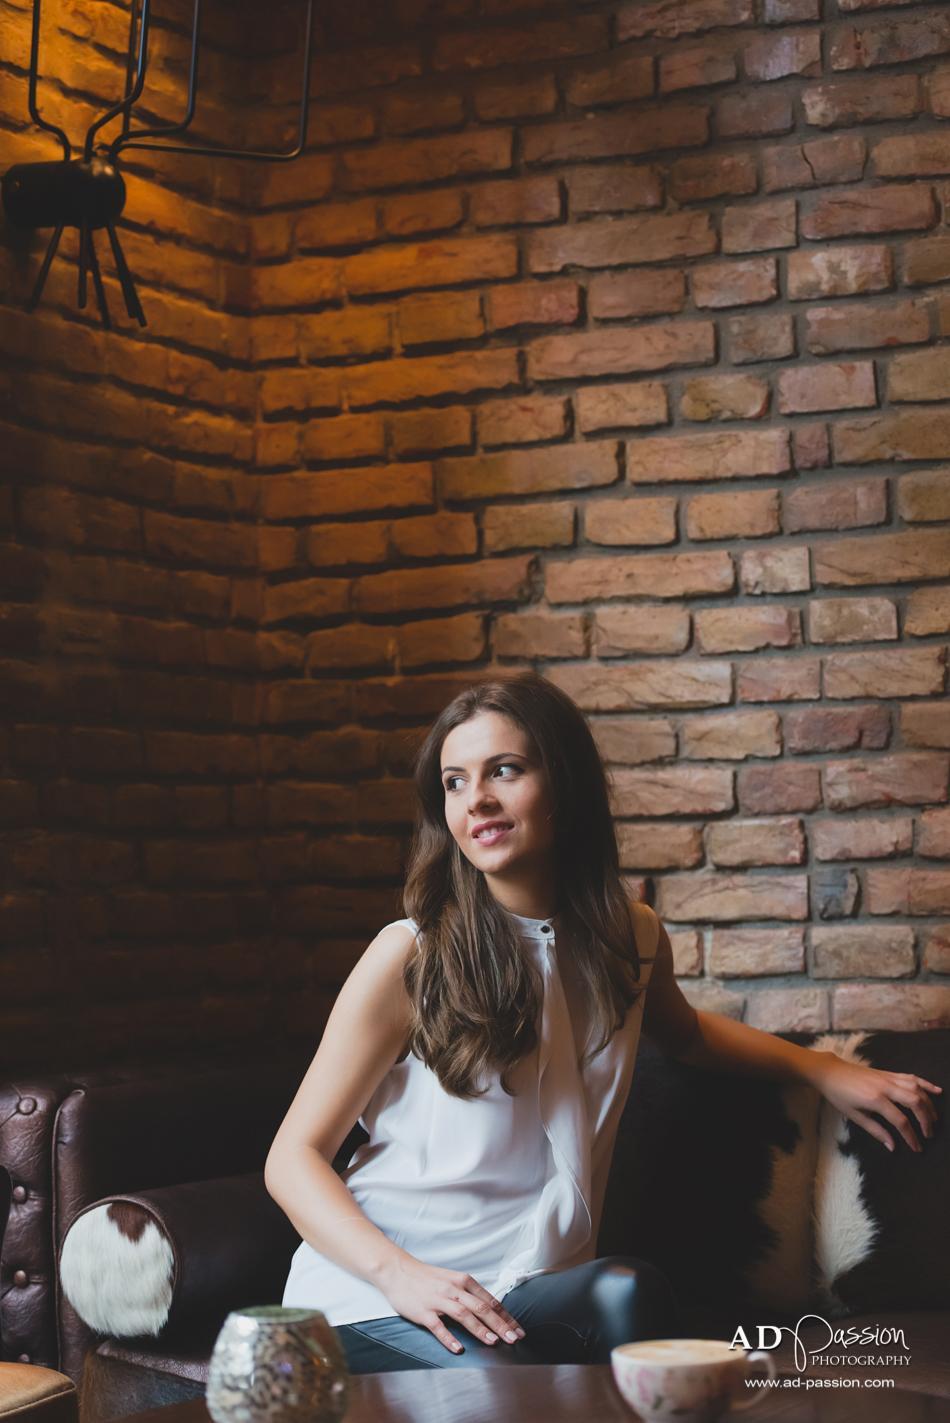 AD Passion Photography | rahela_fotografie-portret-timisoara_0016 | Adelin, Dida, fotograf profesionist, fotograf de nunta, fotografie de nunta, fotograf Timisoara, fotograf Craiova, fotograf Bucuresti, fotograf Arad, nunta Timisoara, nunta Arad, nunta Bucuresti, nunta Craiova